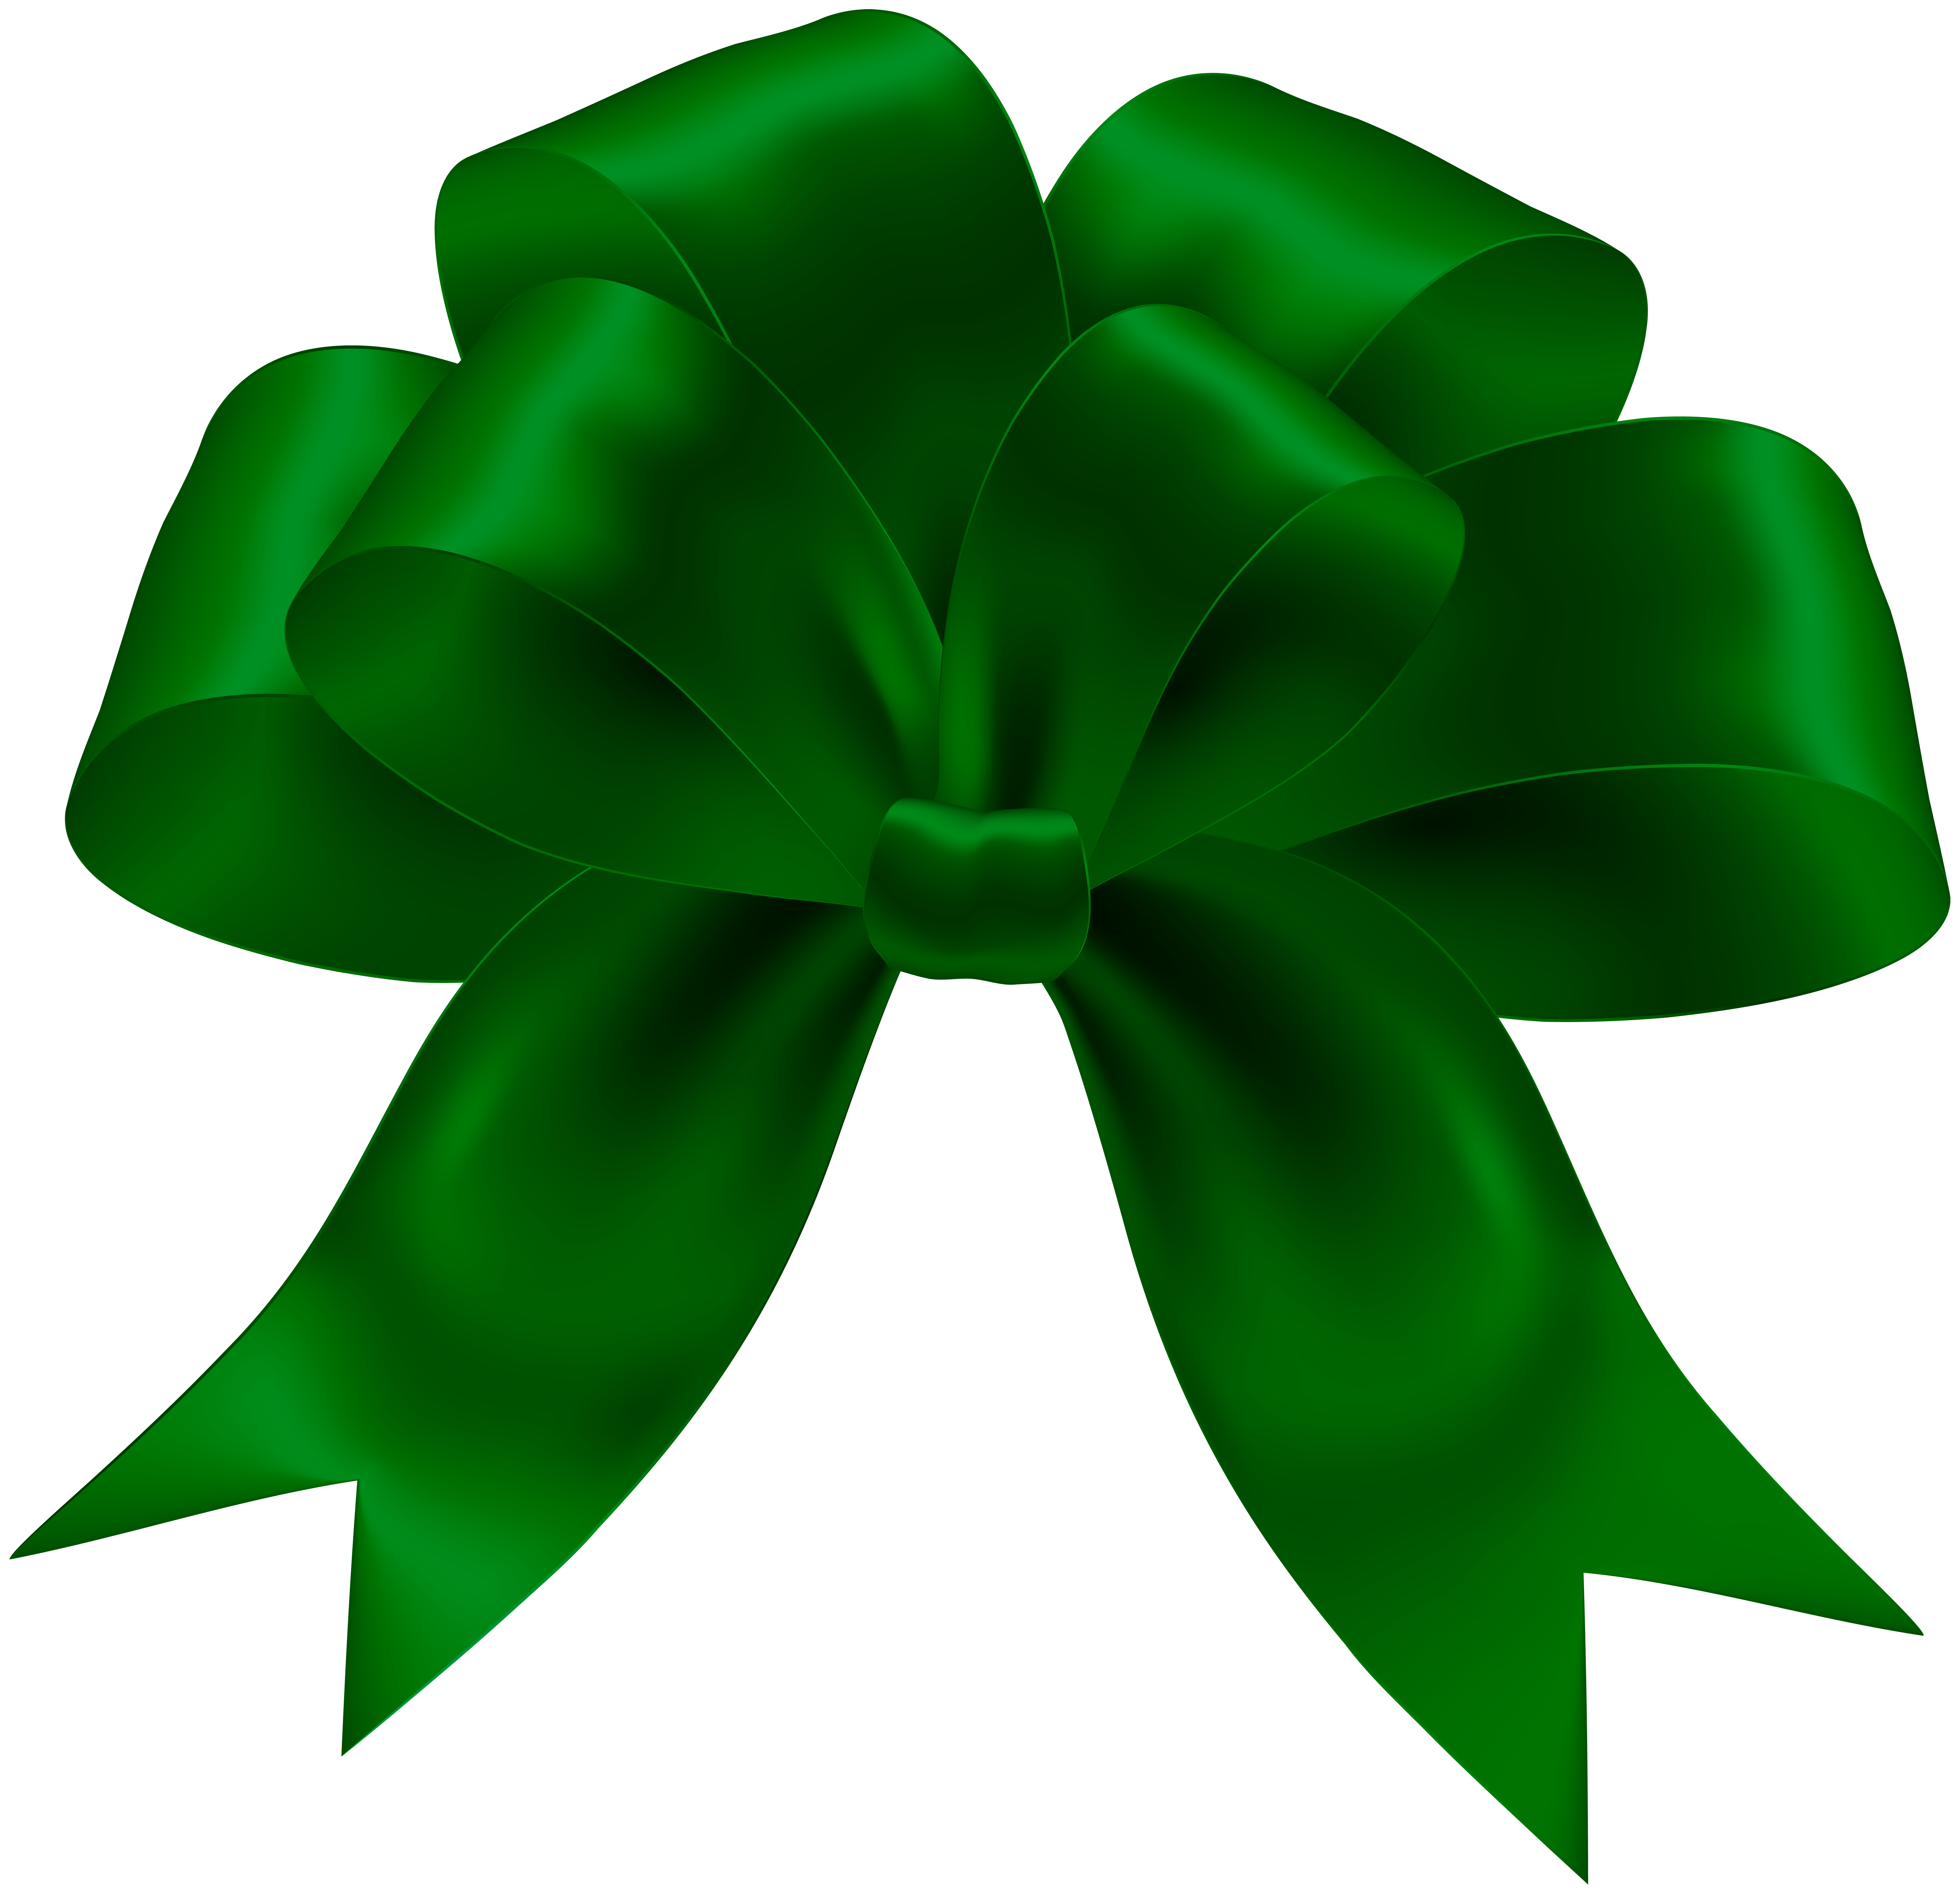 Skincare Skin Clearskin Antiaging Collagen Healthyskin Facemask Skincaretips Skincarejunkie Skincareju In 2020 Green Bows Black Texture Background Ribbon Png